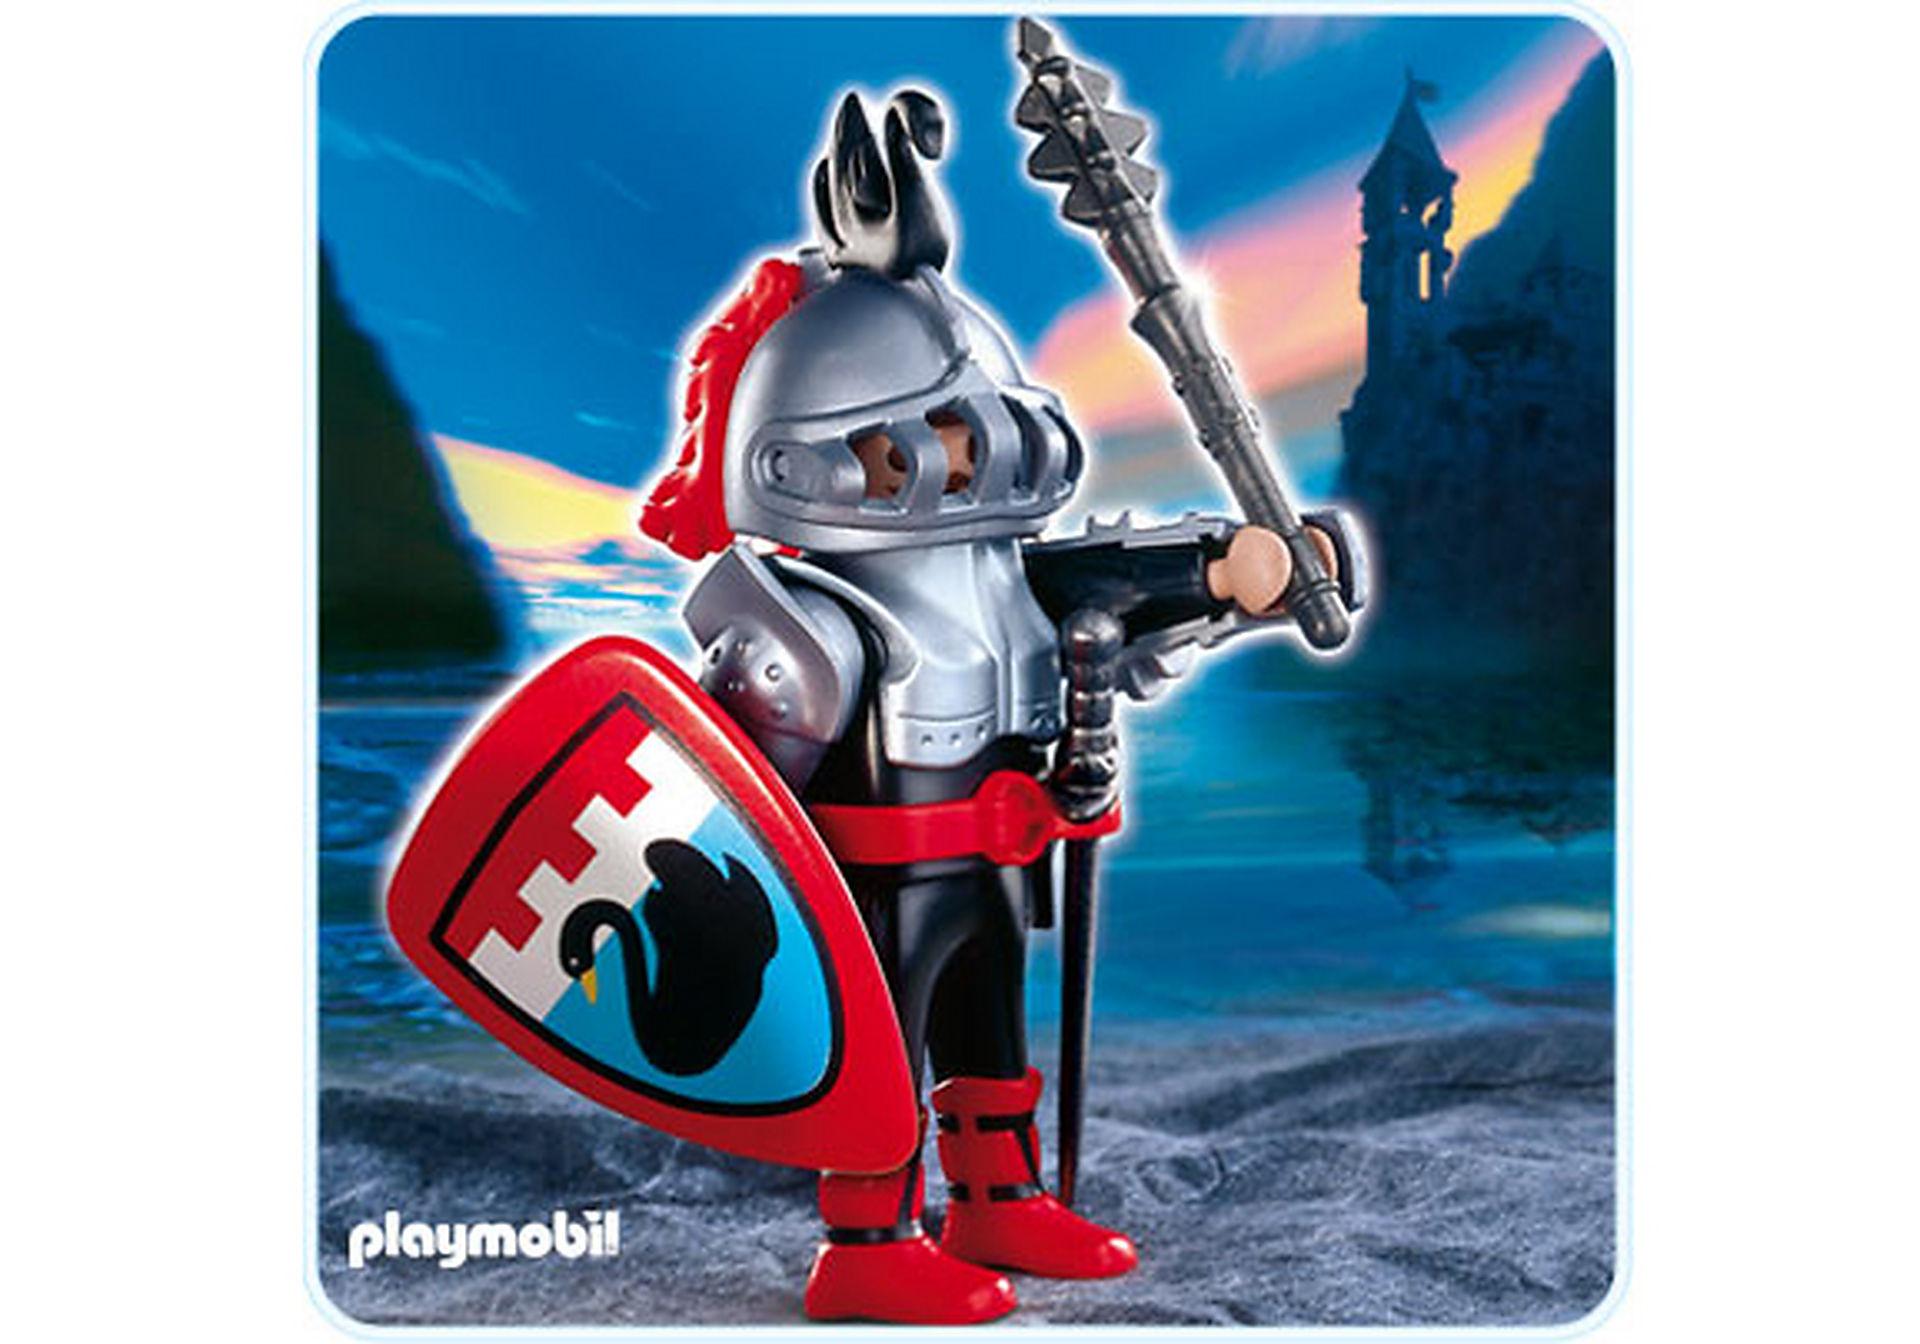 http://media.playmobil.com/i/playmobil/4689-A_product_detail/Schwanenritter